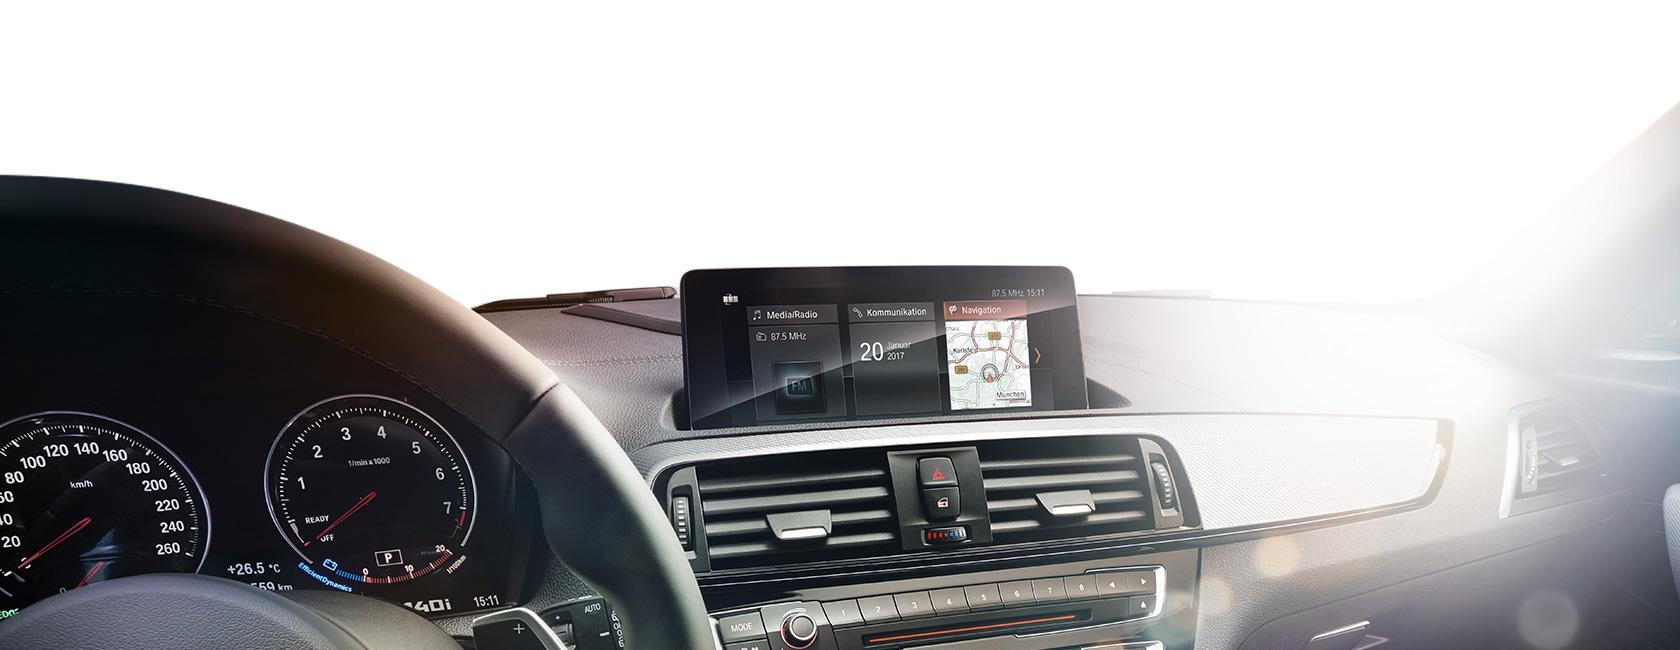 BMW 1 Serisi Lounge Atmosferi